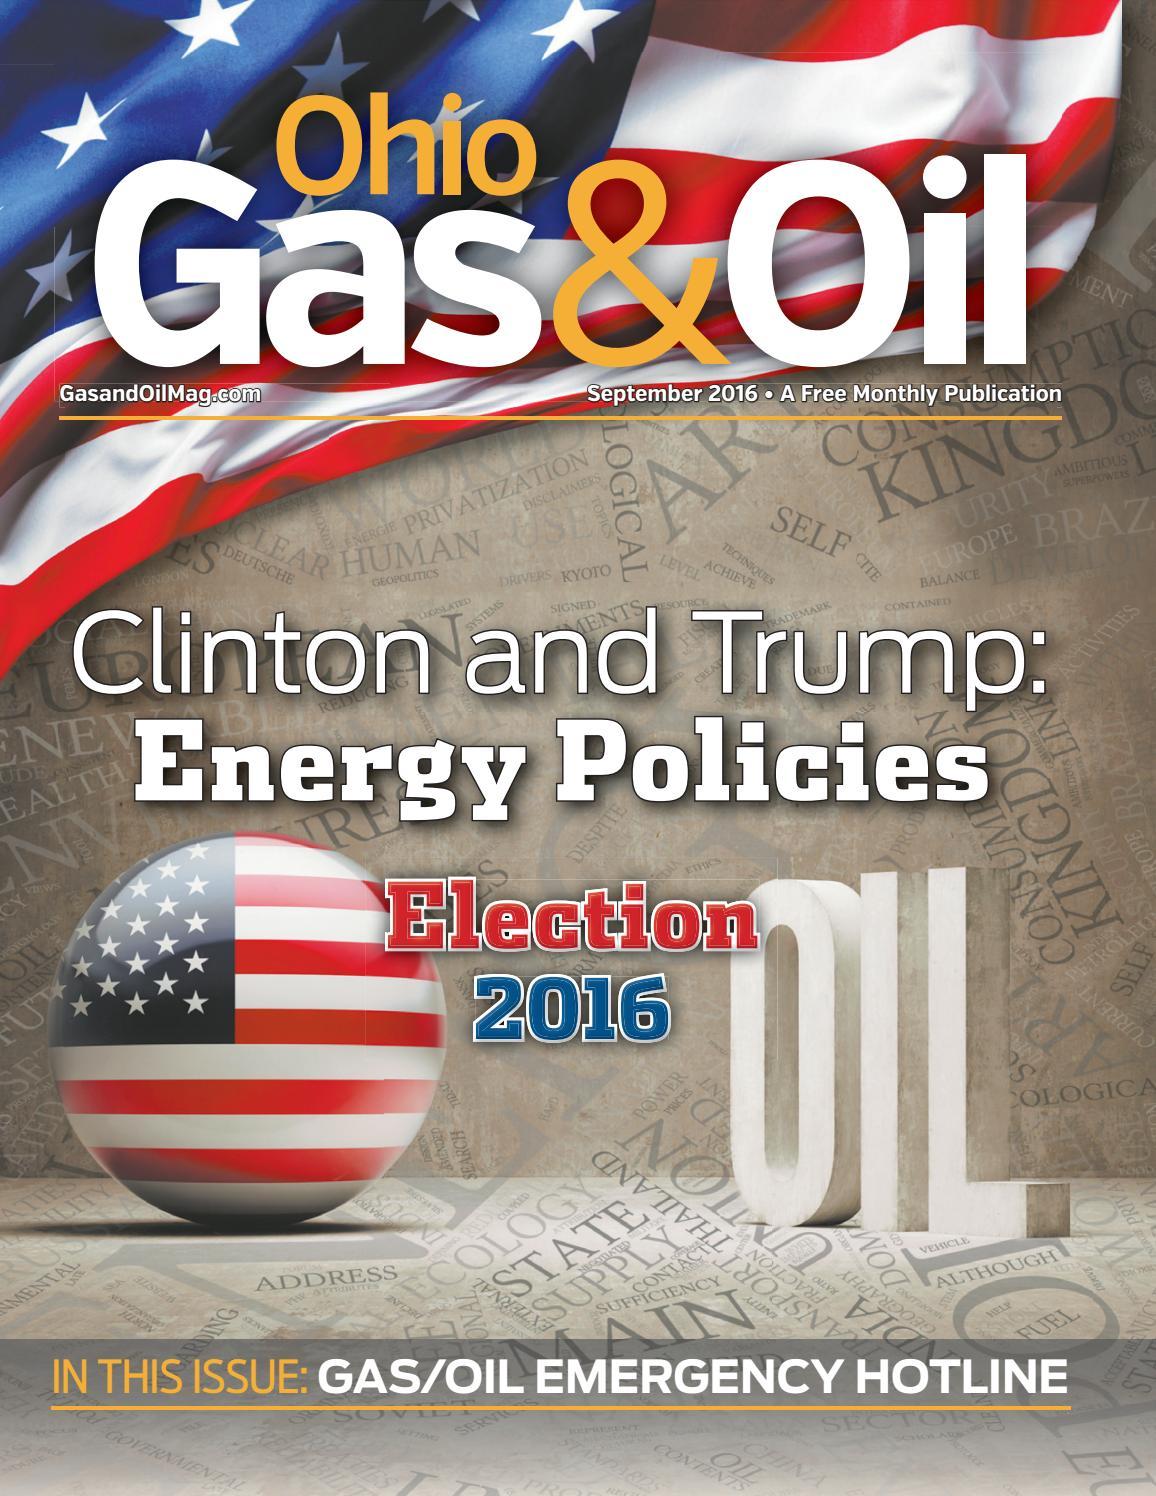 Ohio Gas u0026 Oil Magazine September 2016 by GateHouse Media NEO - issuu